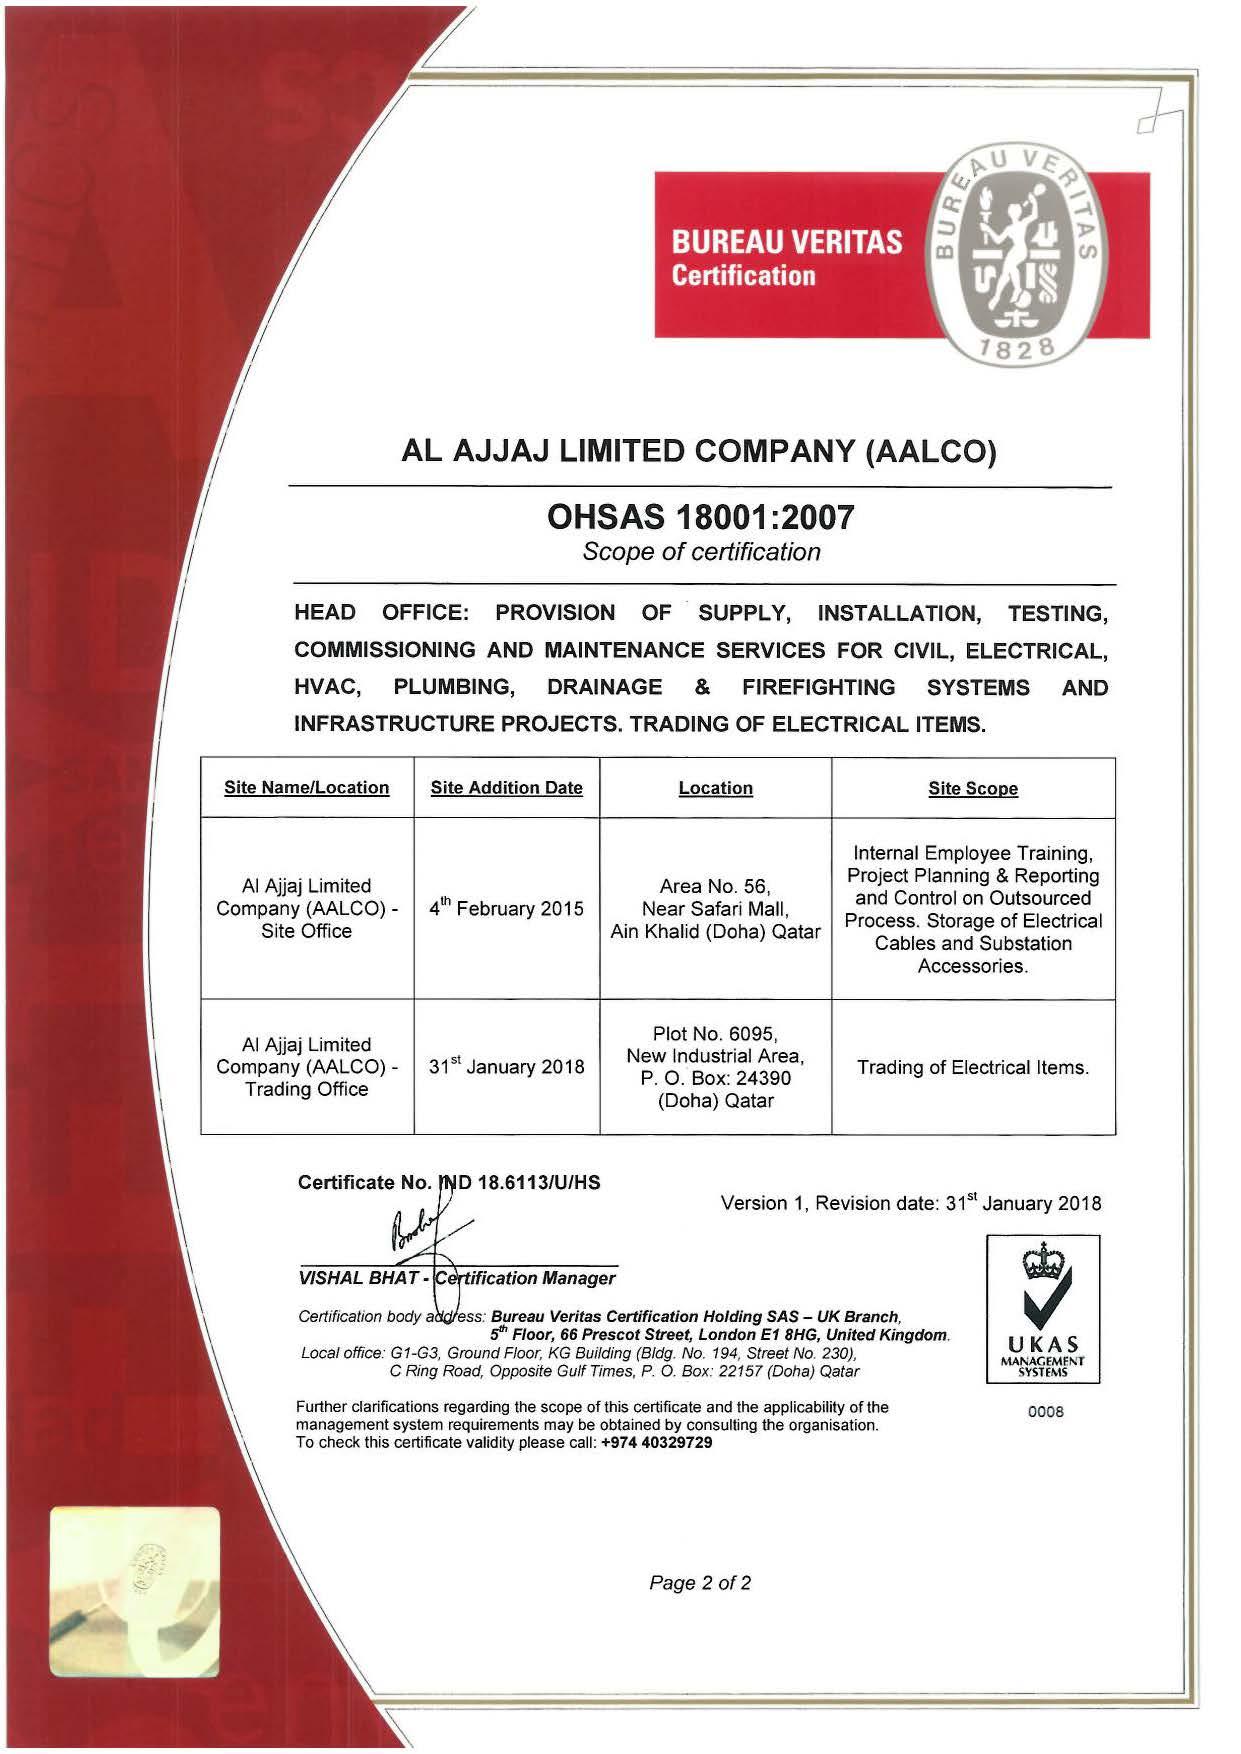 OHSAS 18001-2007 Certificate